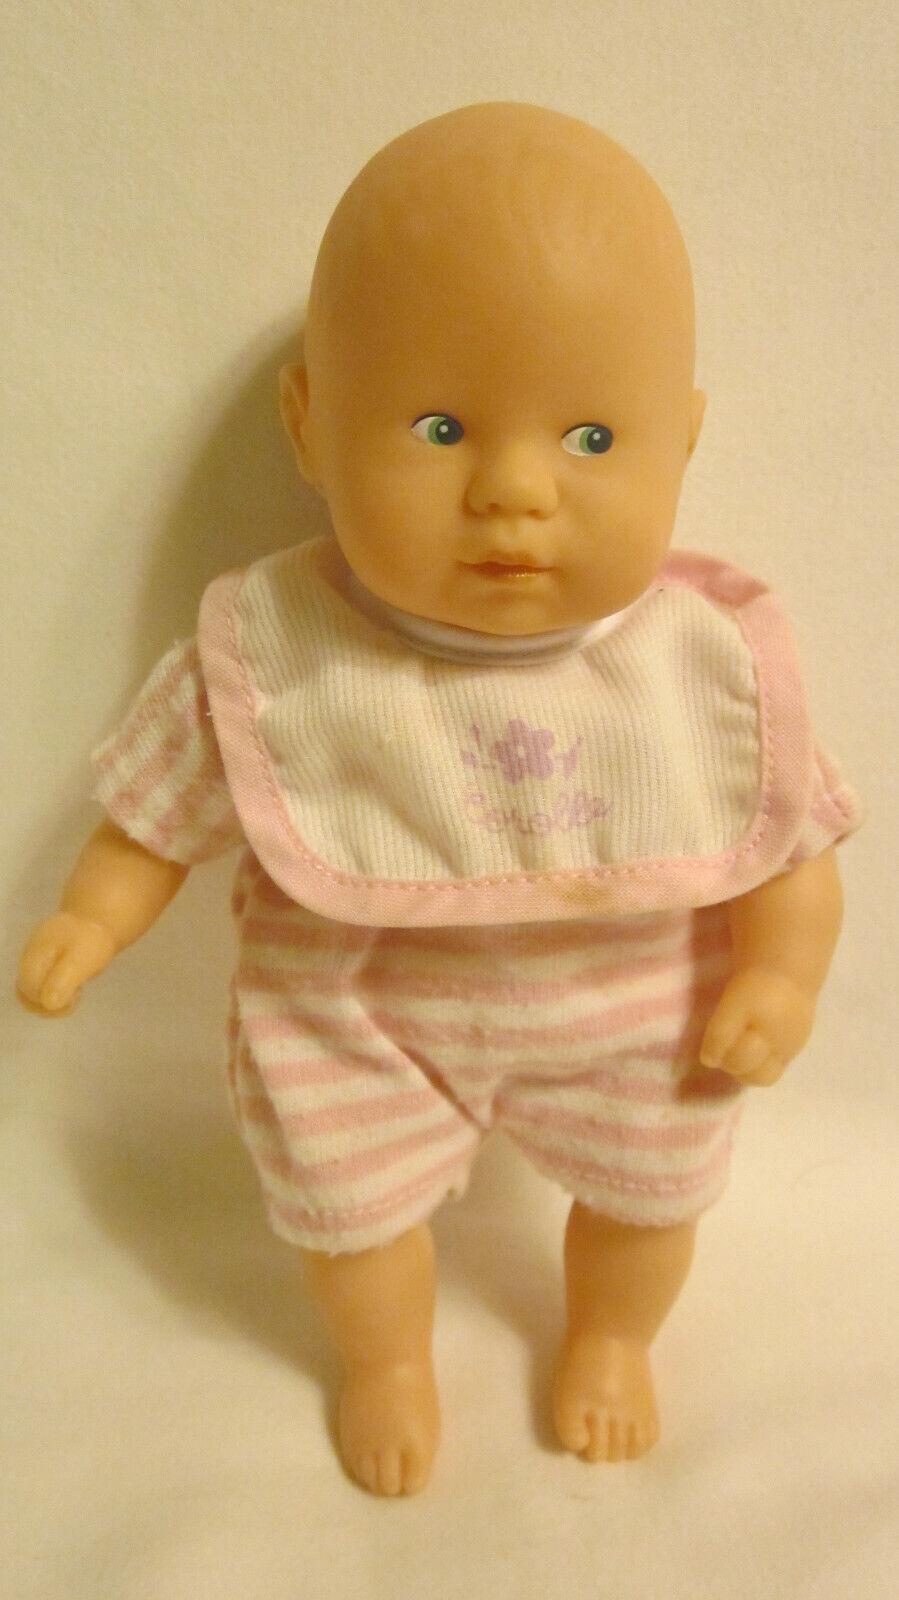 COROLLE MINI BABY DOLL, 8 , VINYL W/CLOTH BODY, BLOND, BLUE EYES, ORIG. ROMPER - $11.99